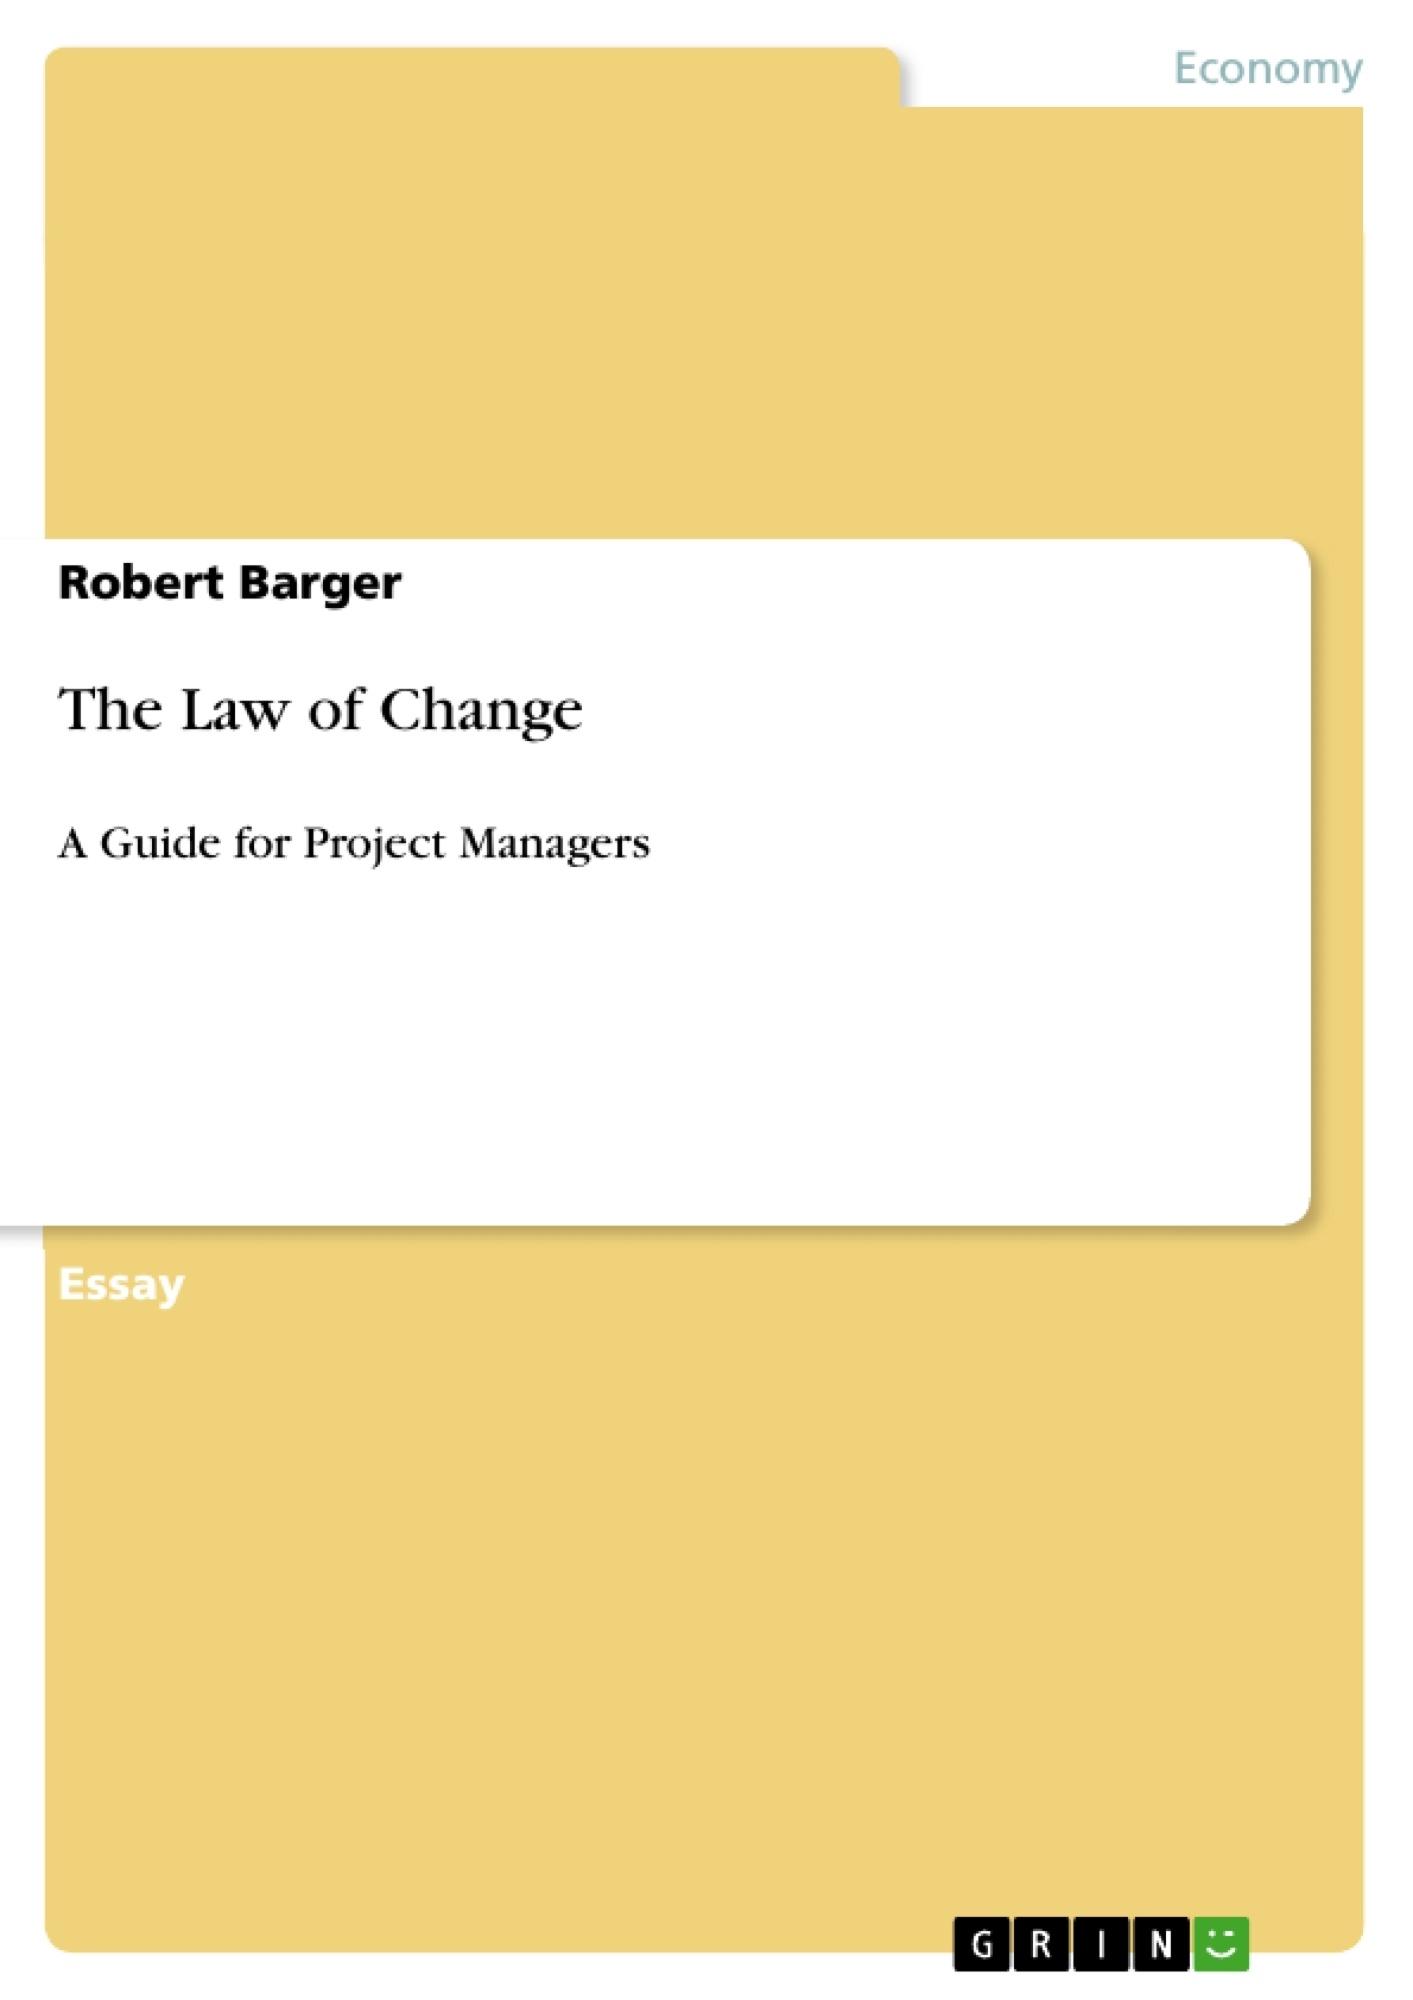 governance change essay